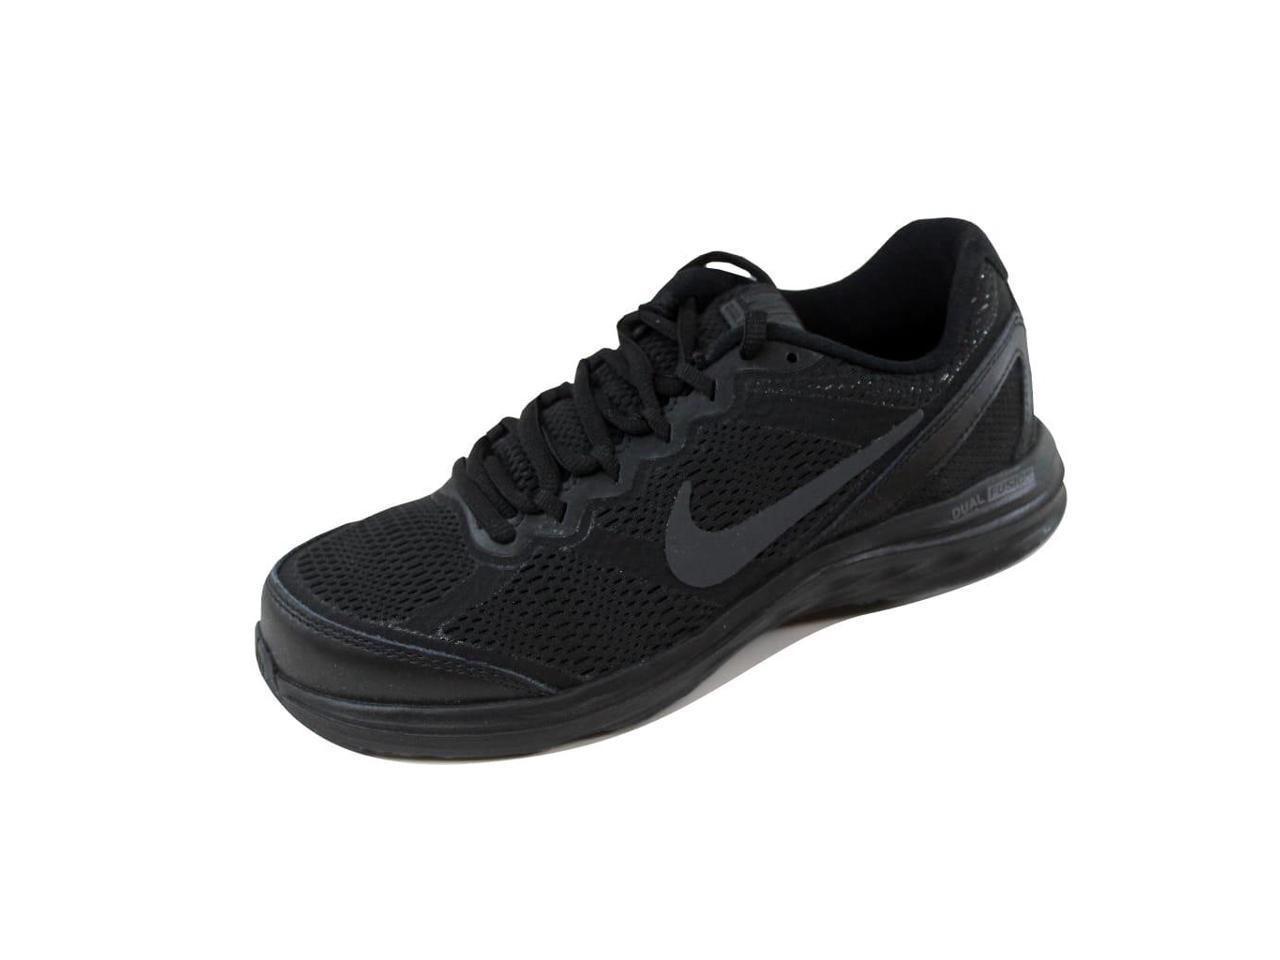 Nike Women's Dual Fusion Run 6 3 Black/Black-Anthracite 653594-020 Size 6 Run b876de